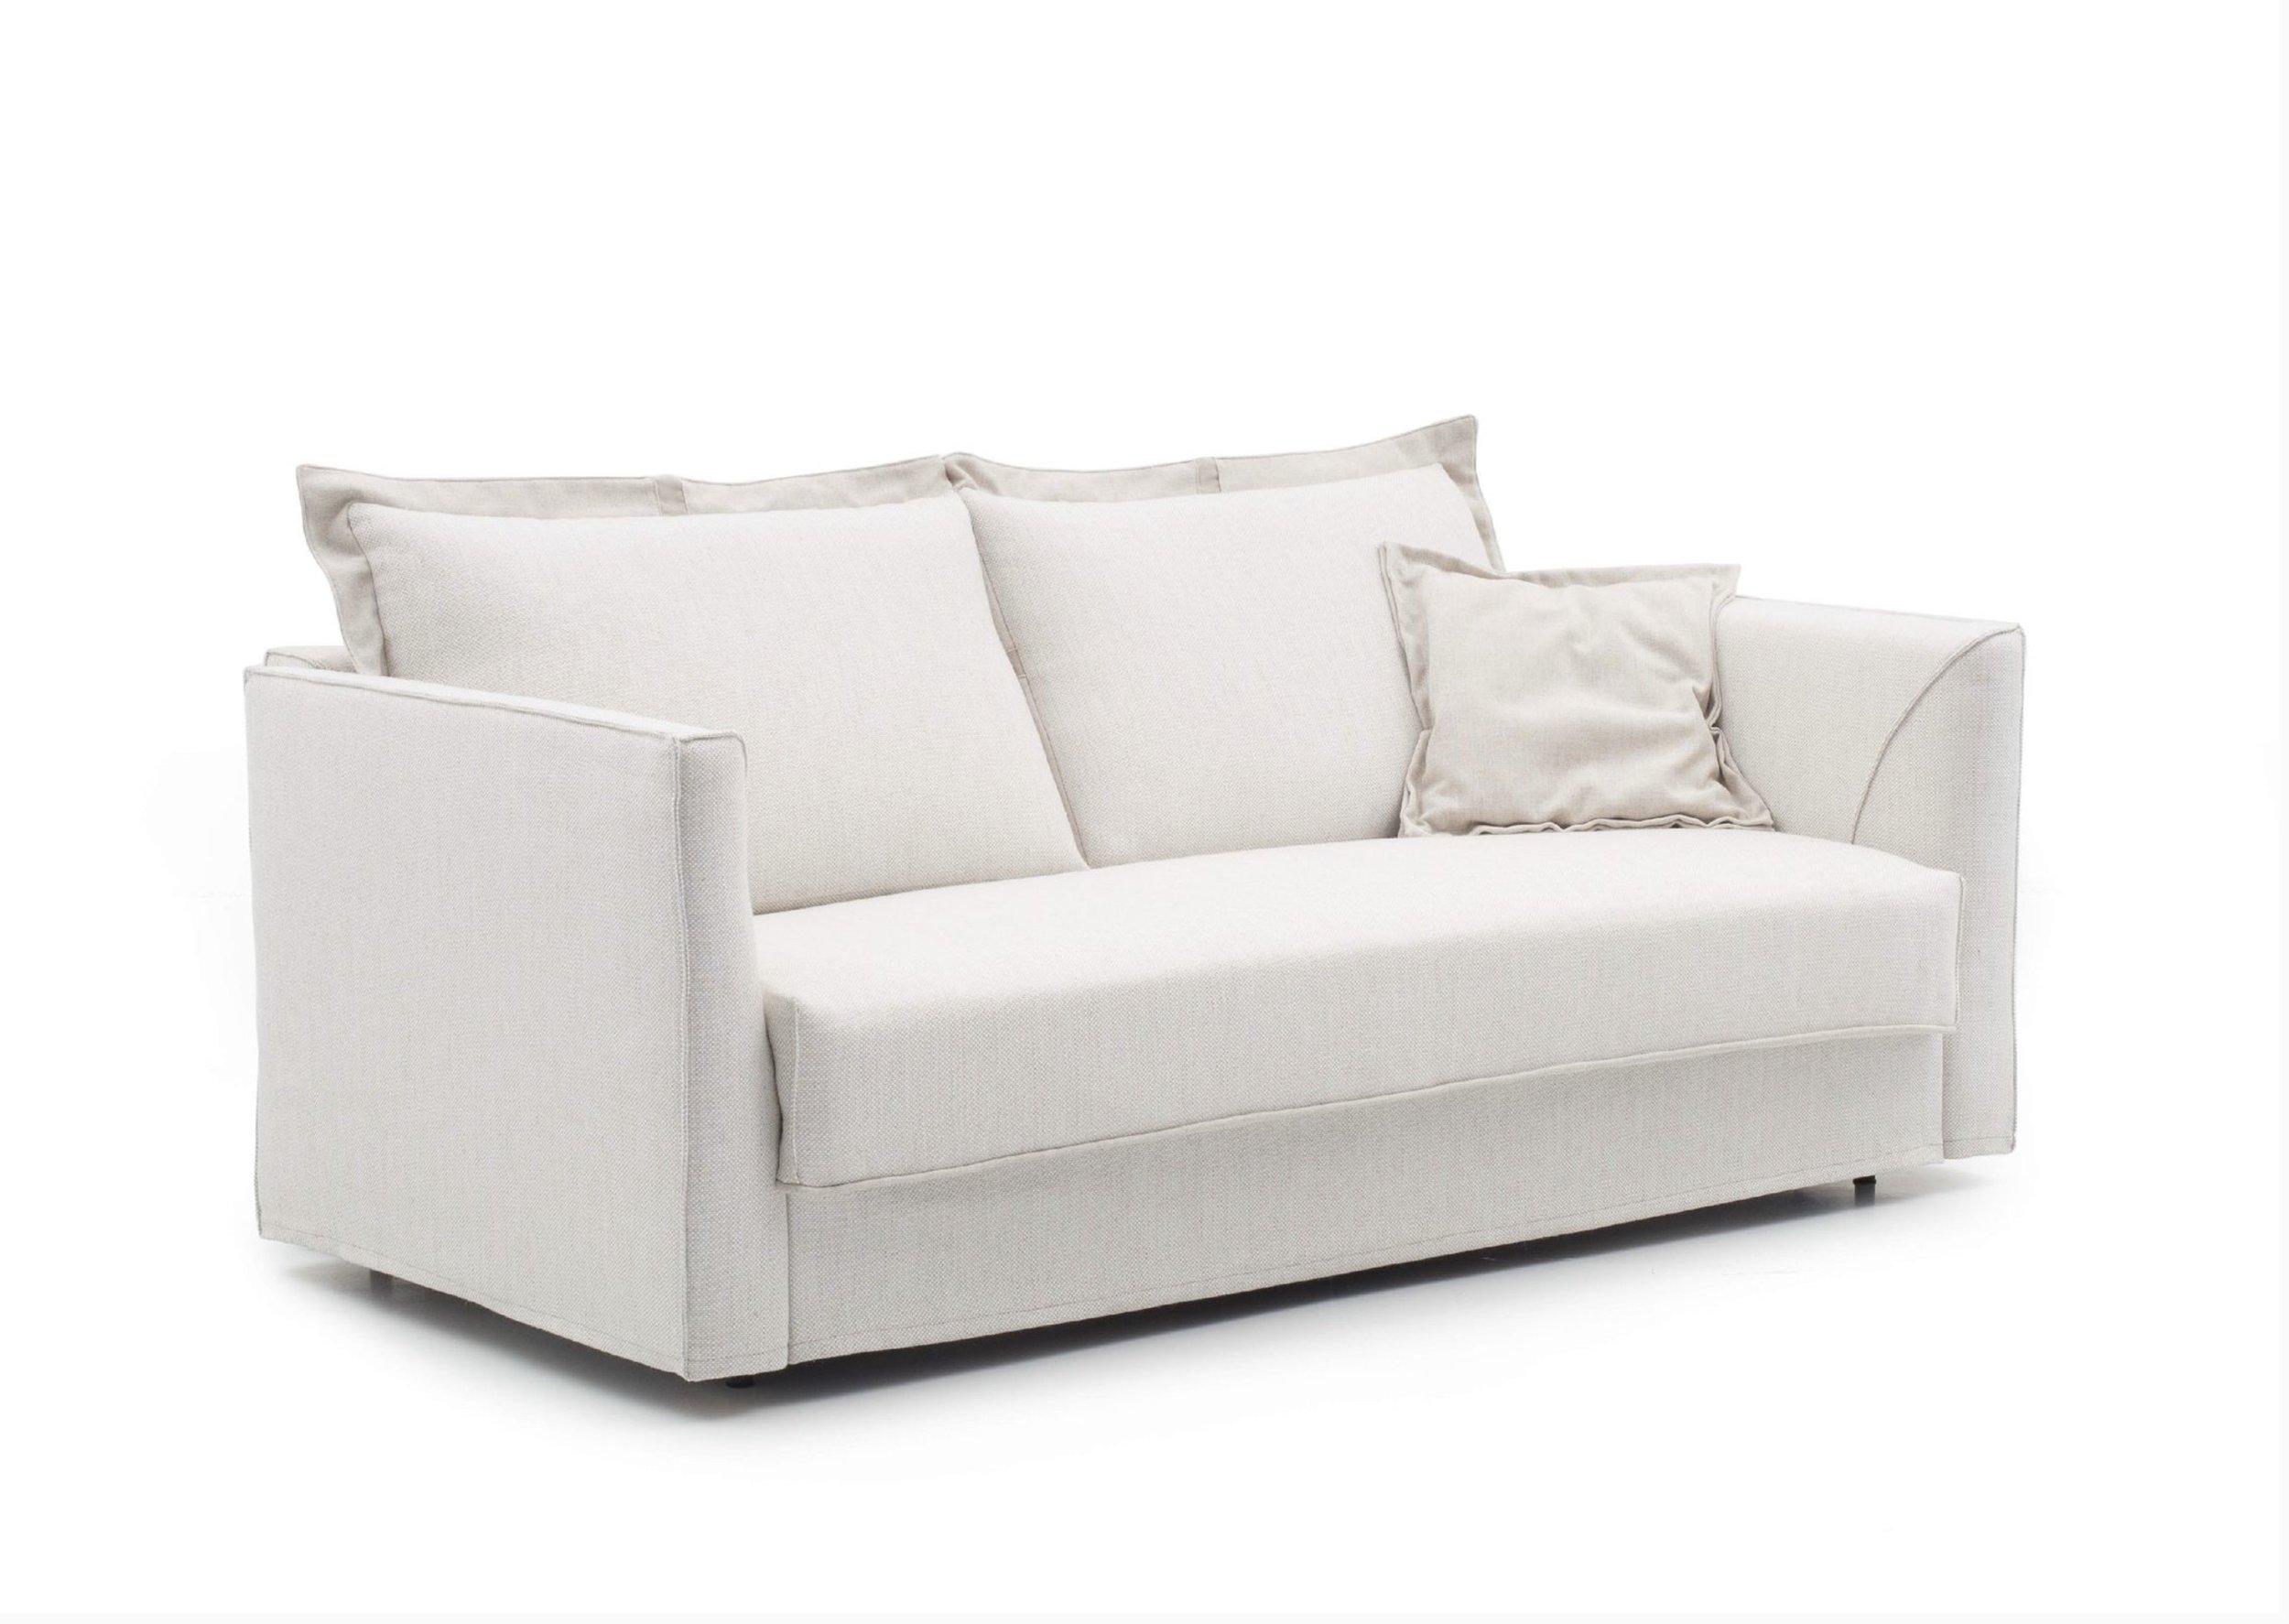 SBD 121 Modern Sofa Bed